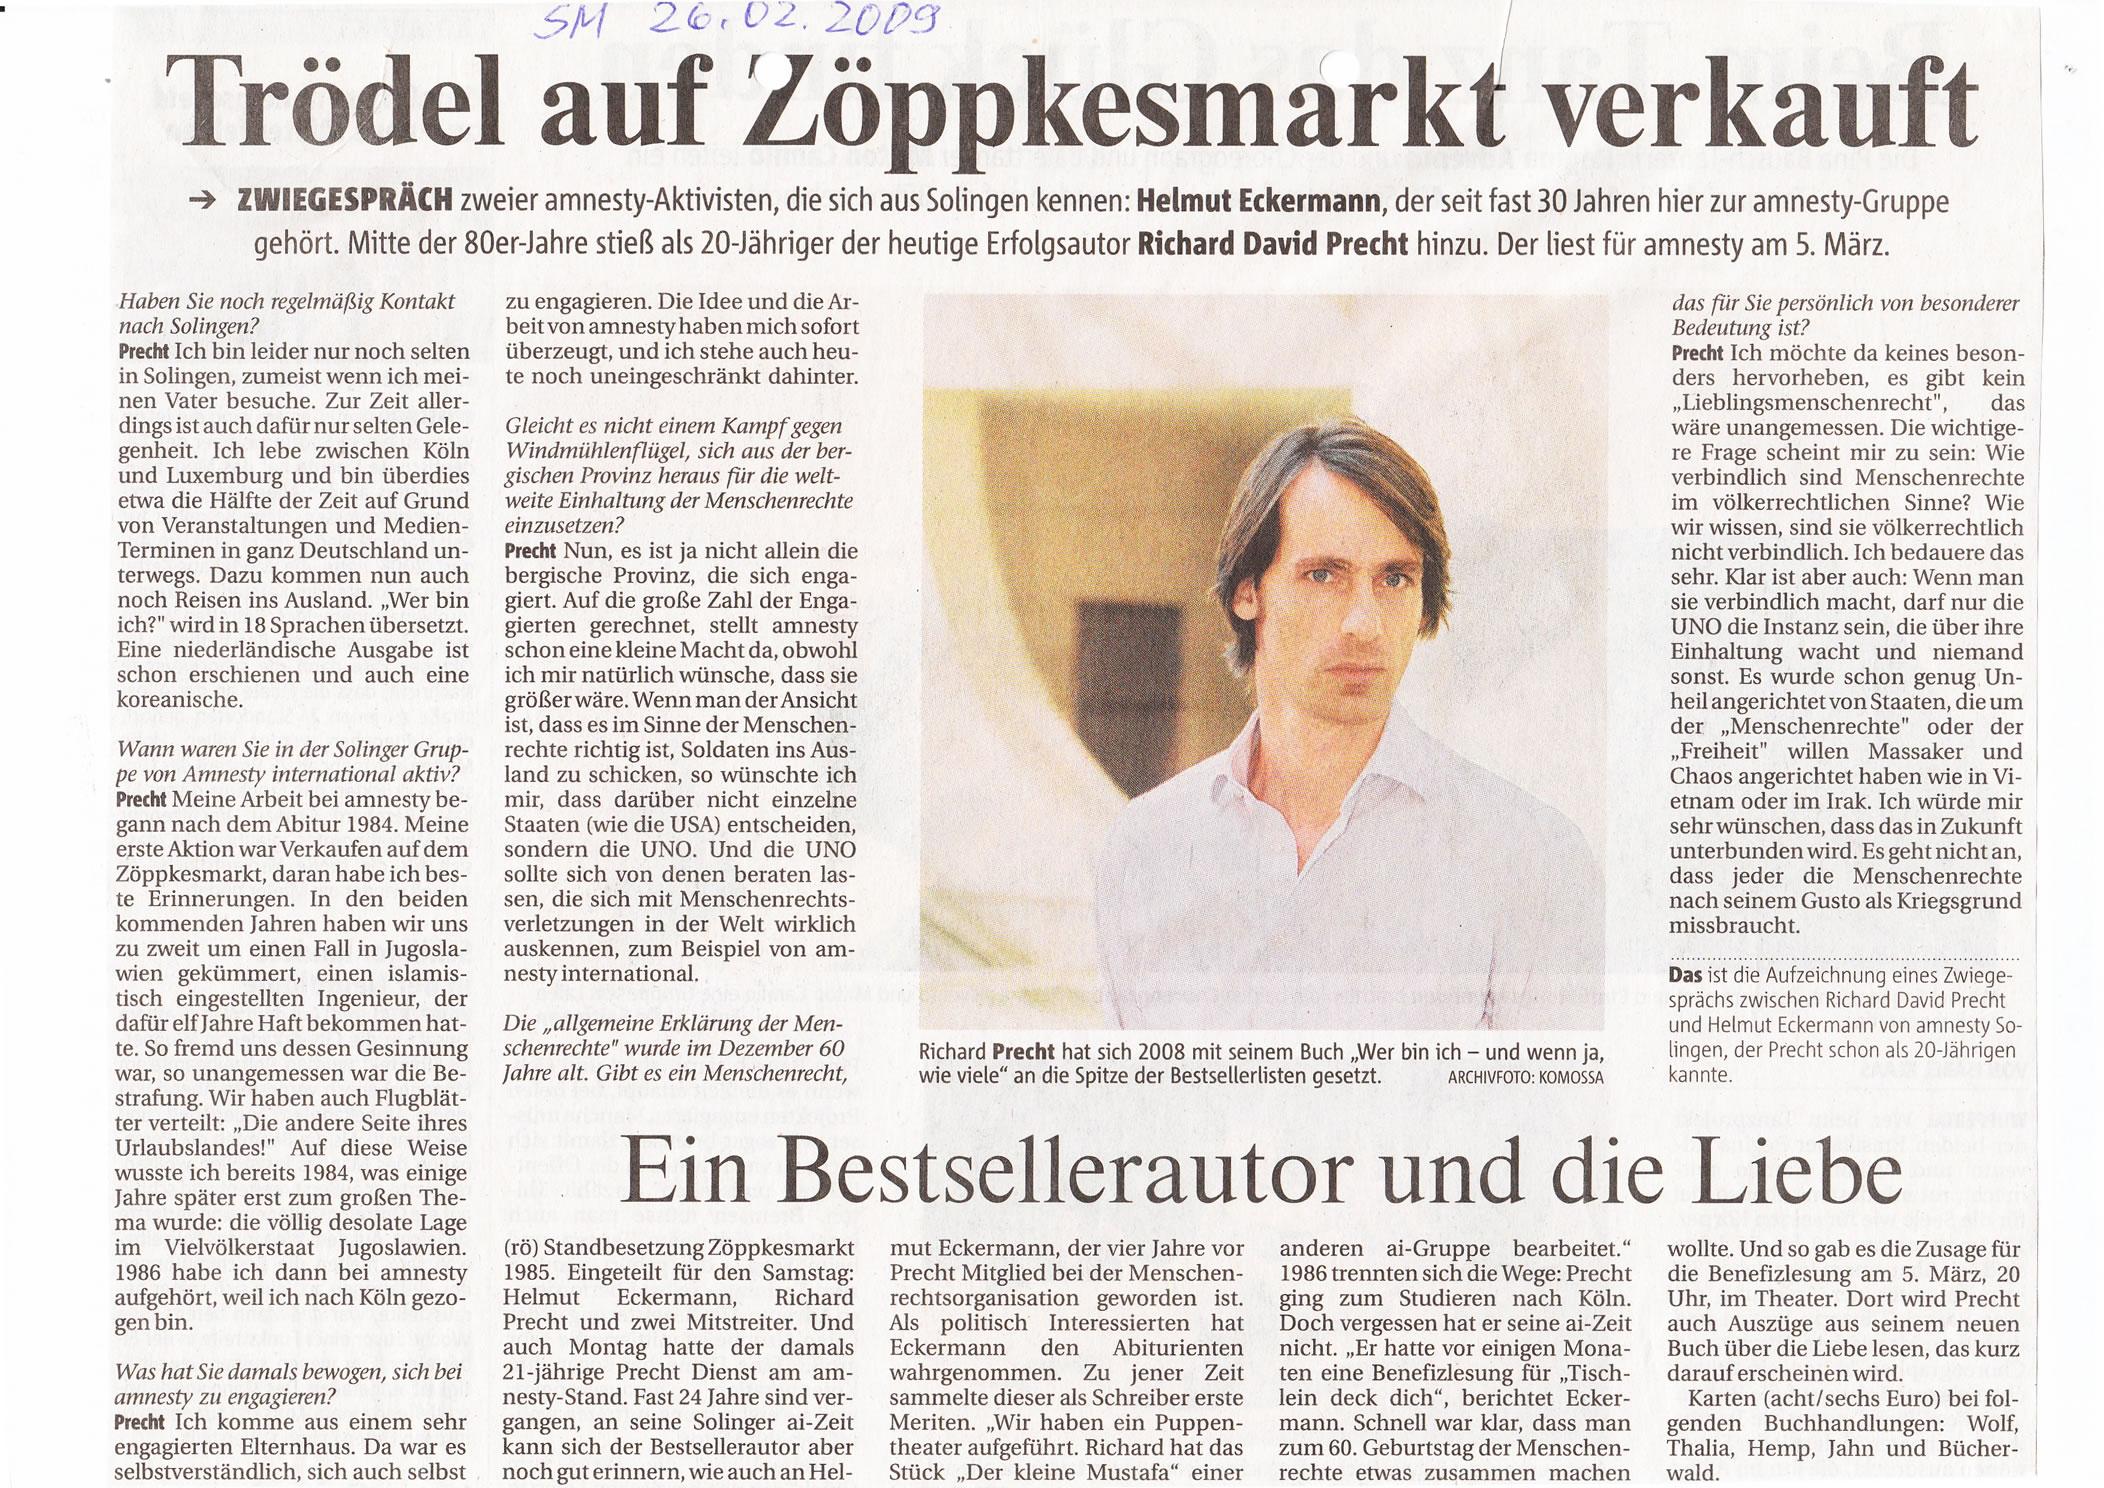 Solinger Morgenpost 02/09: Interview Helmut Eckermann + Richard David Precht